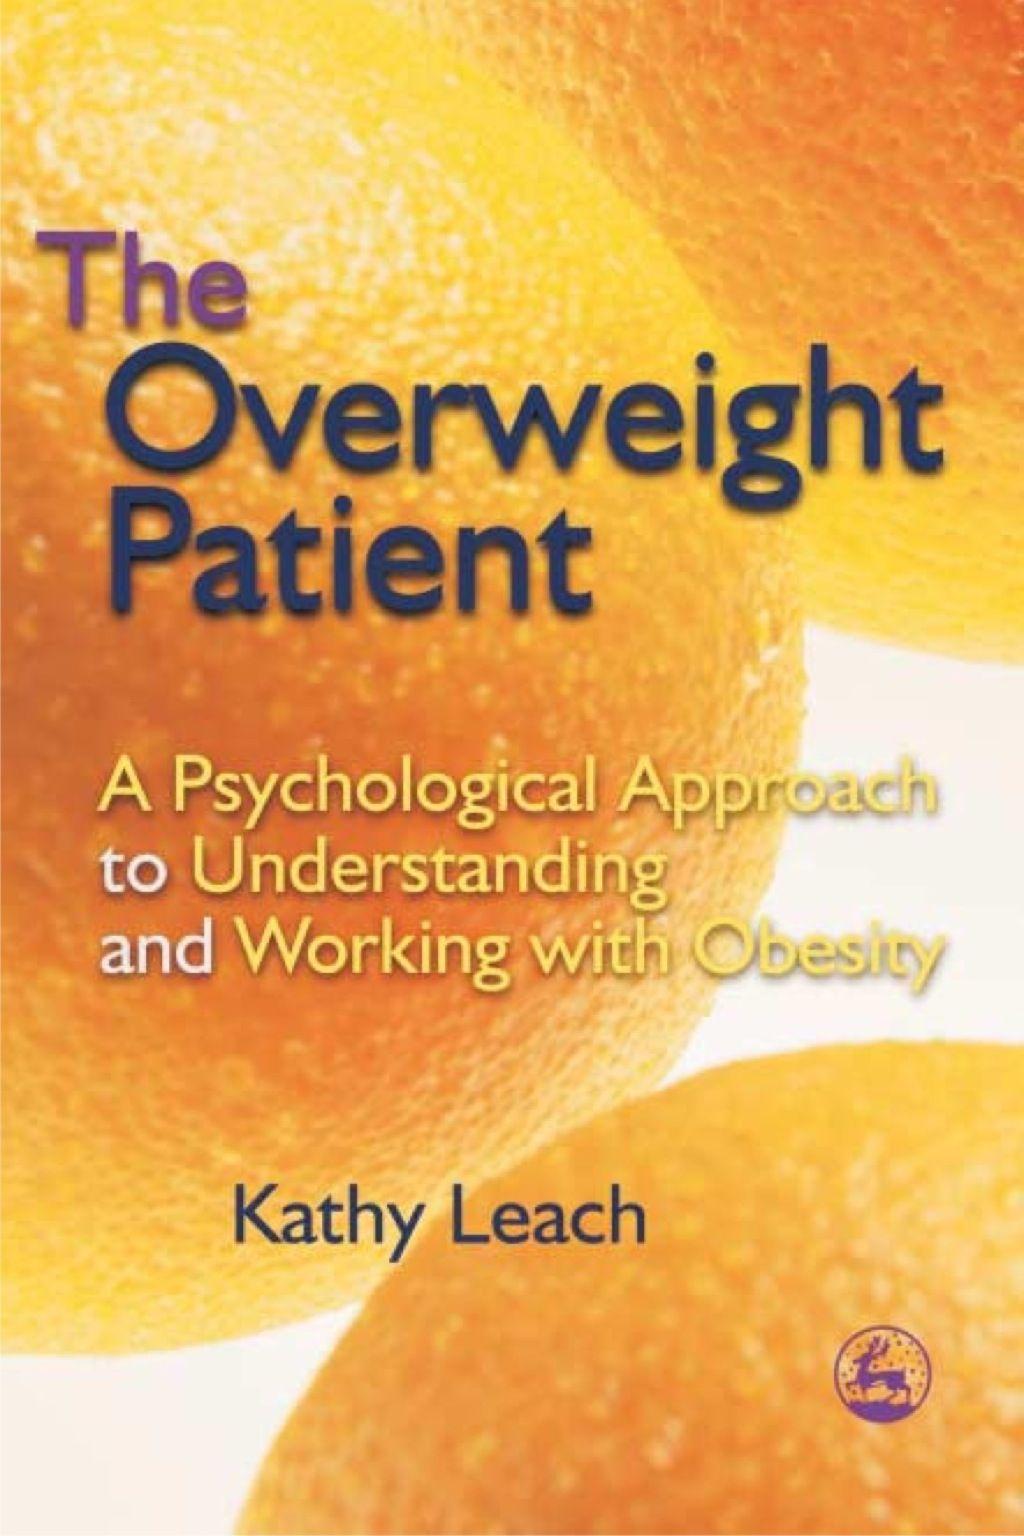 The Overweight Patient Ebook